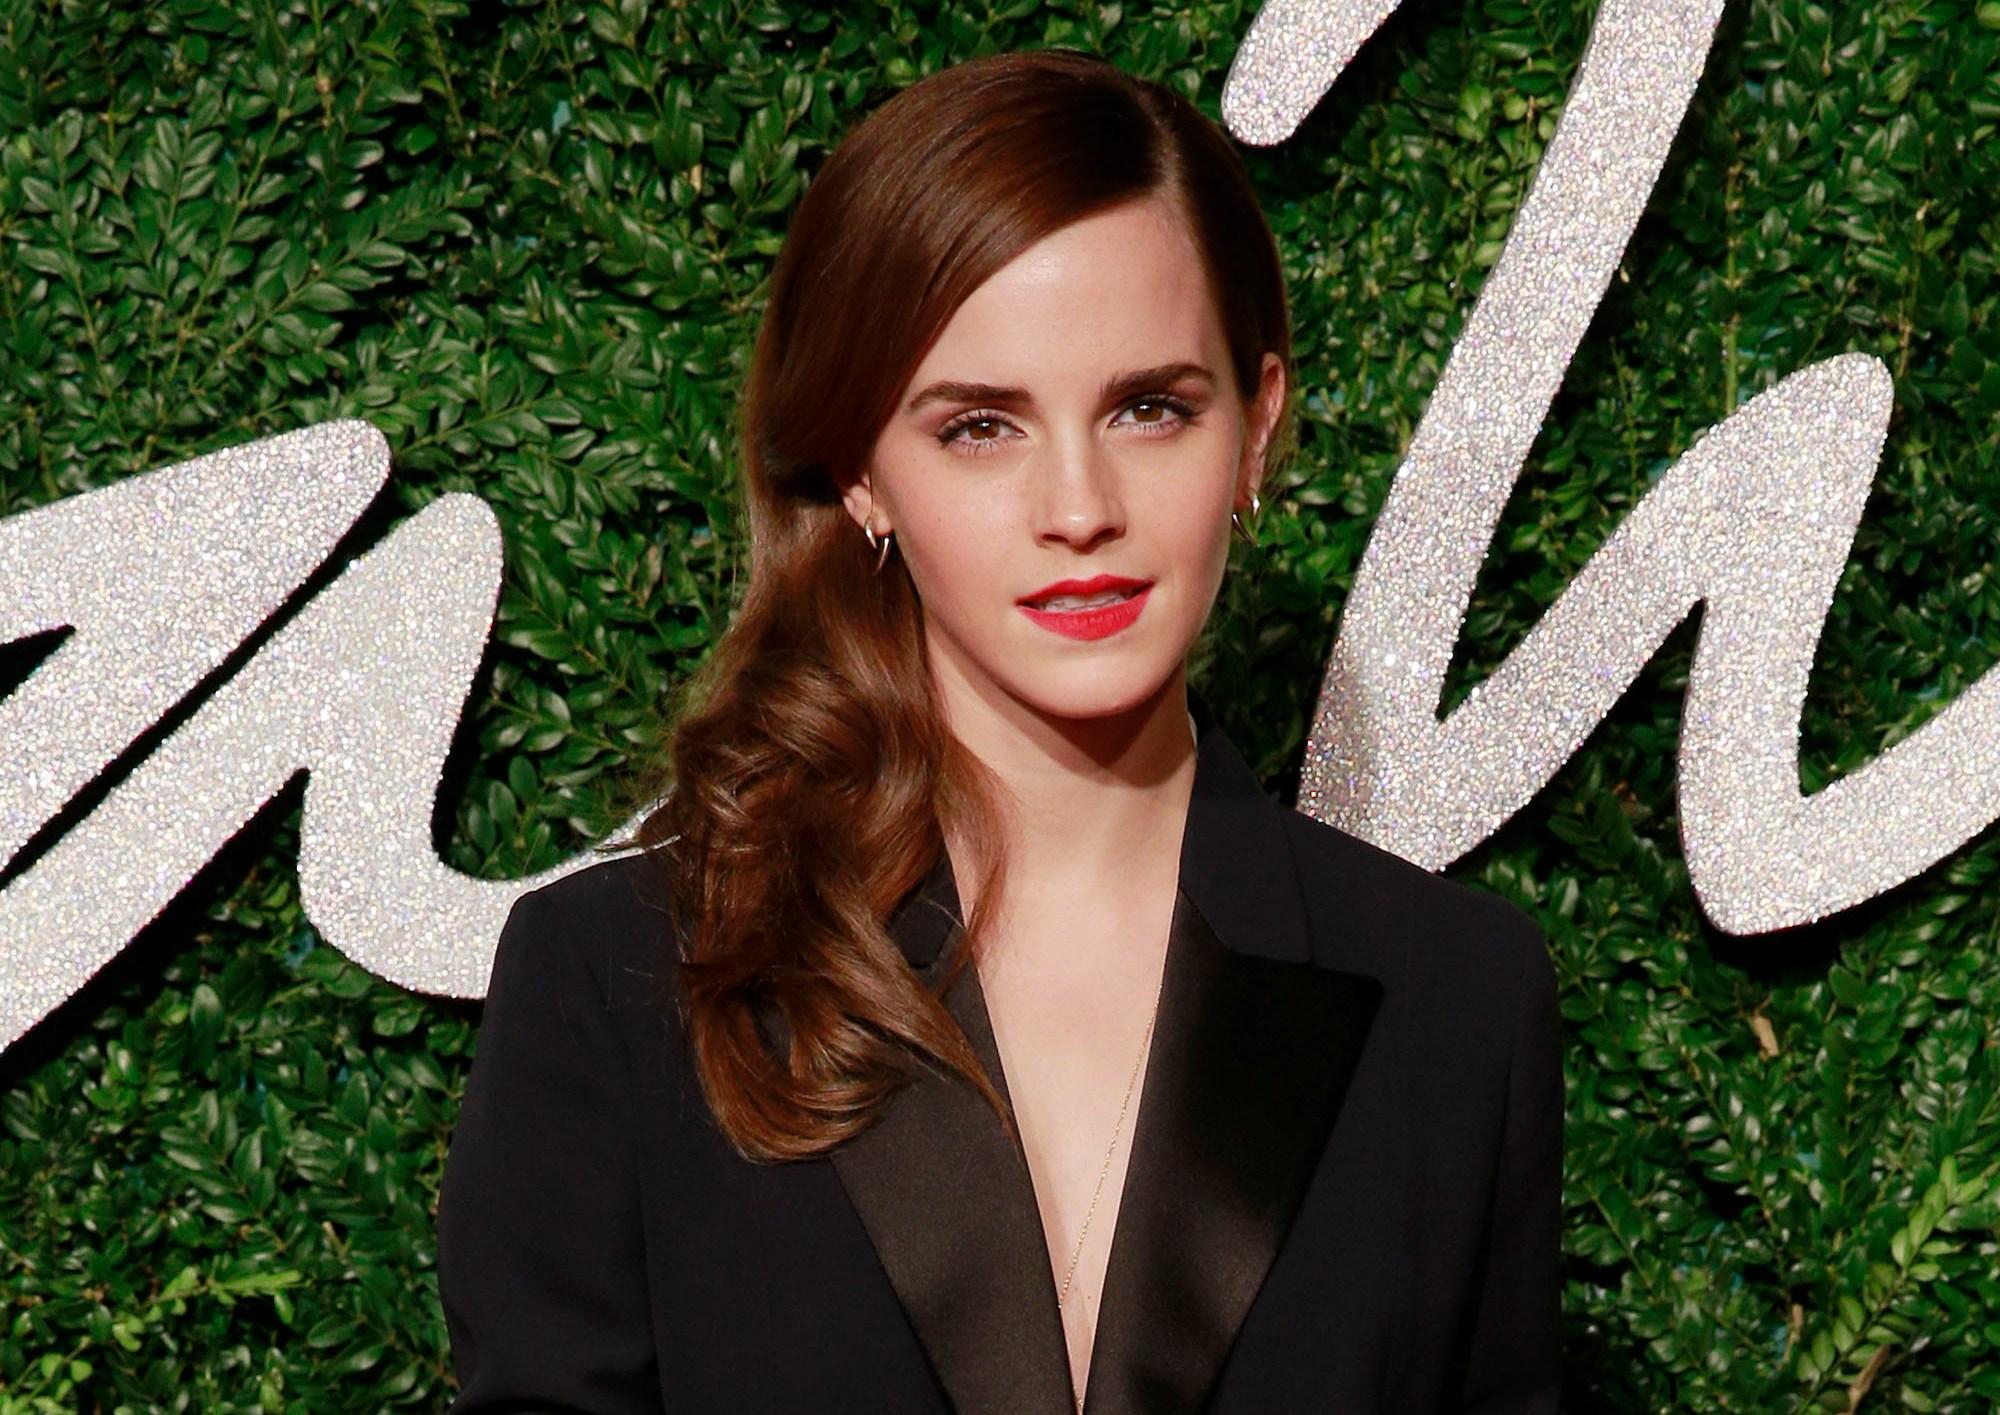 Emma Watson Beauty and the Beast